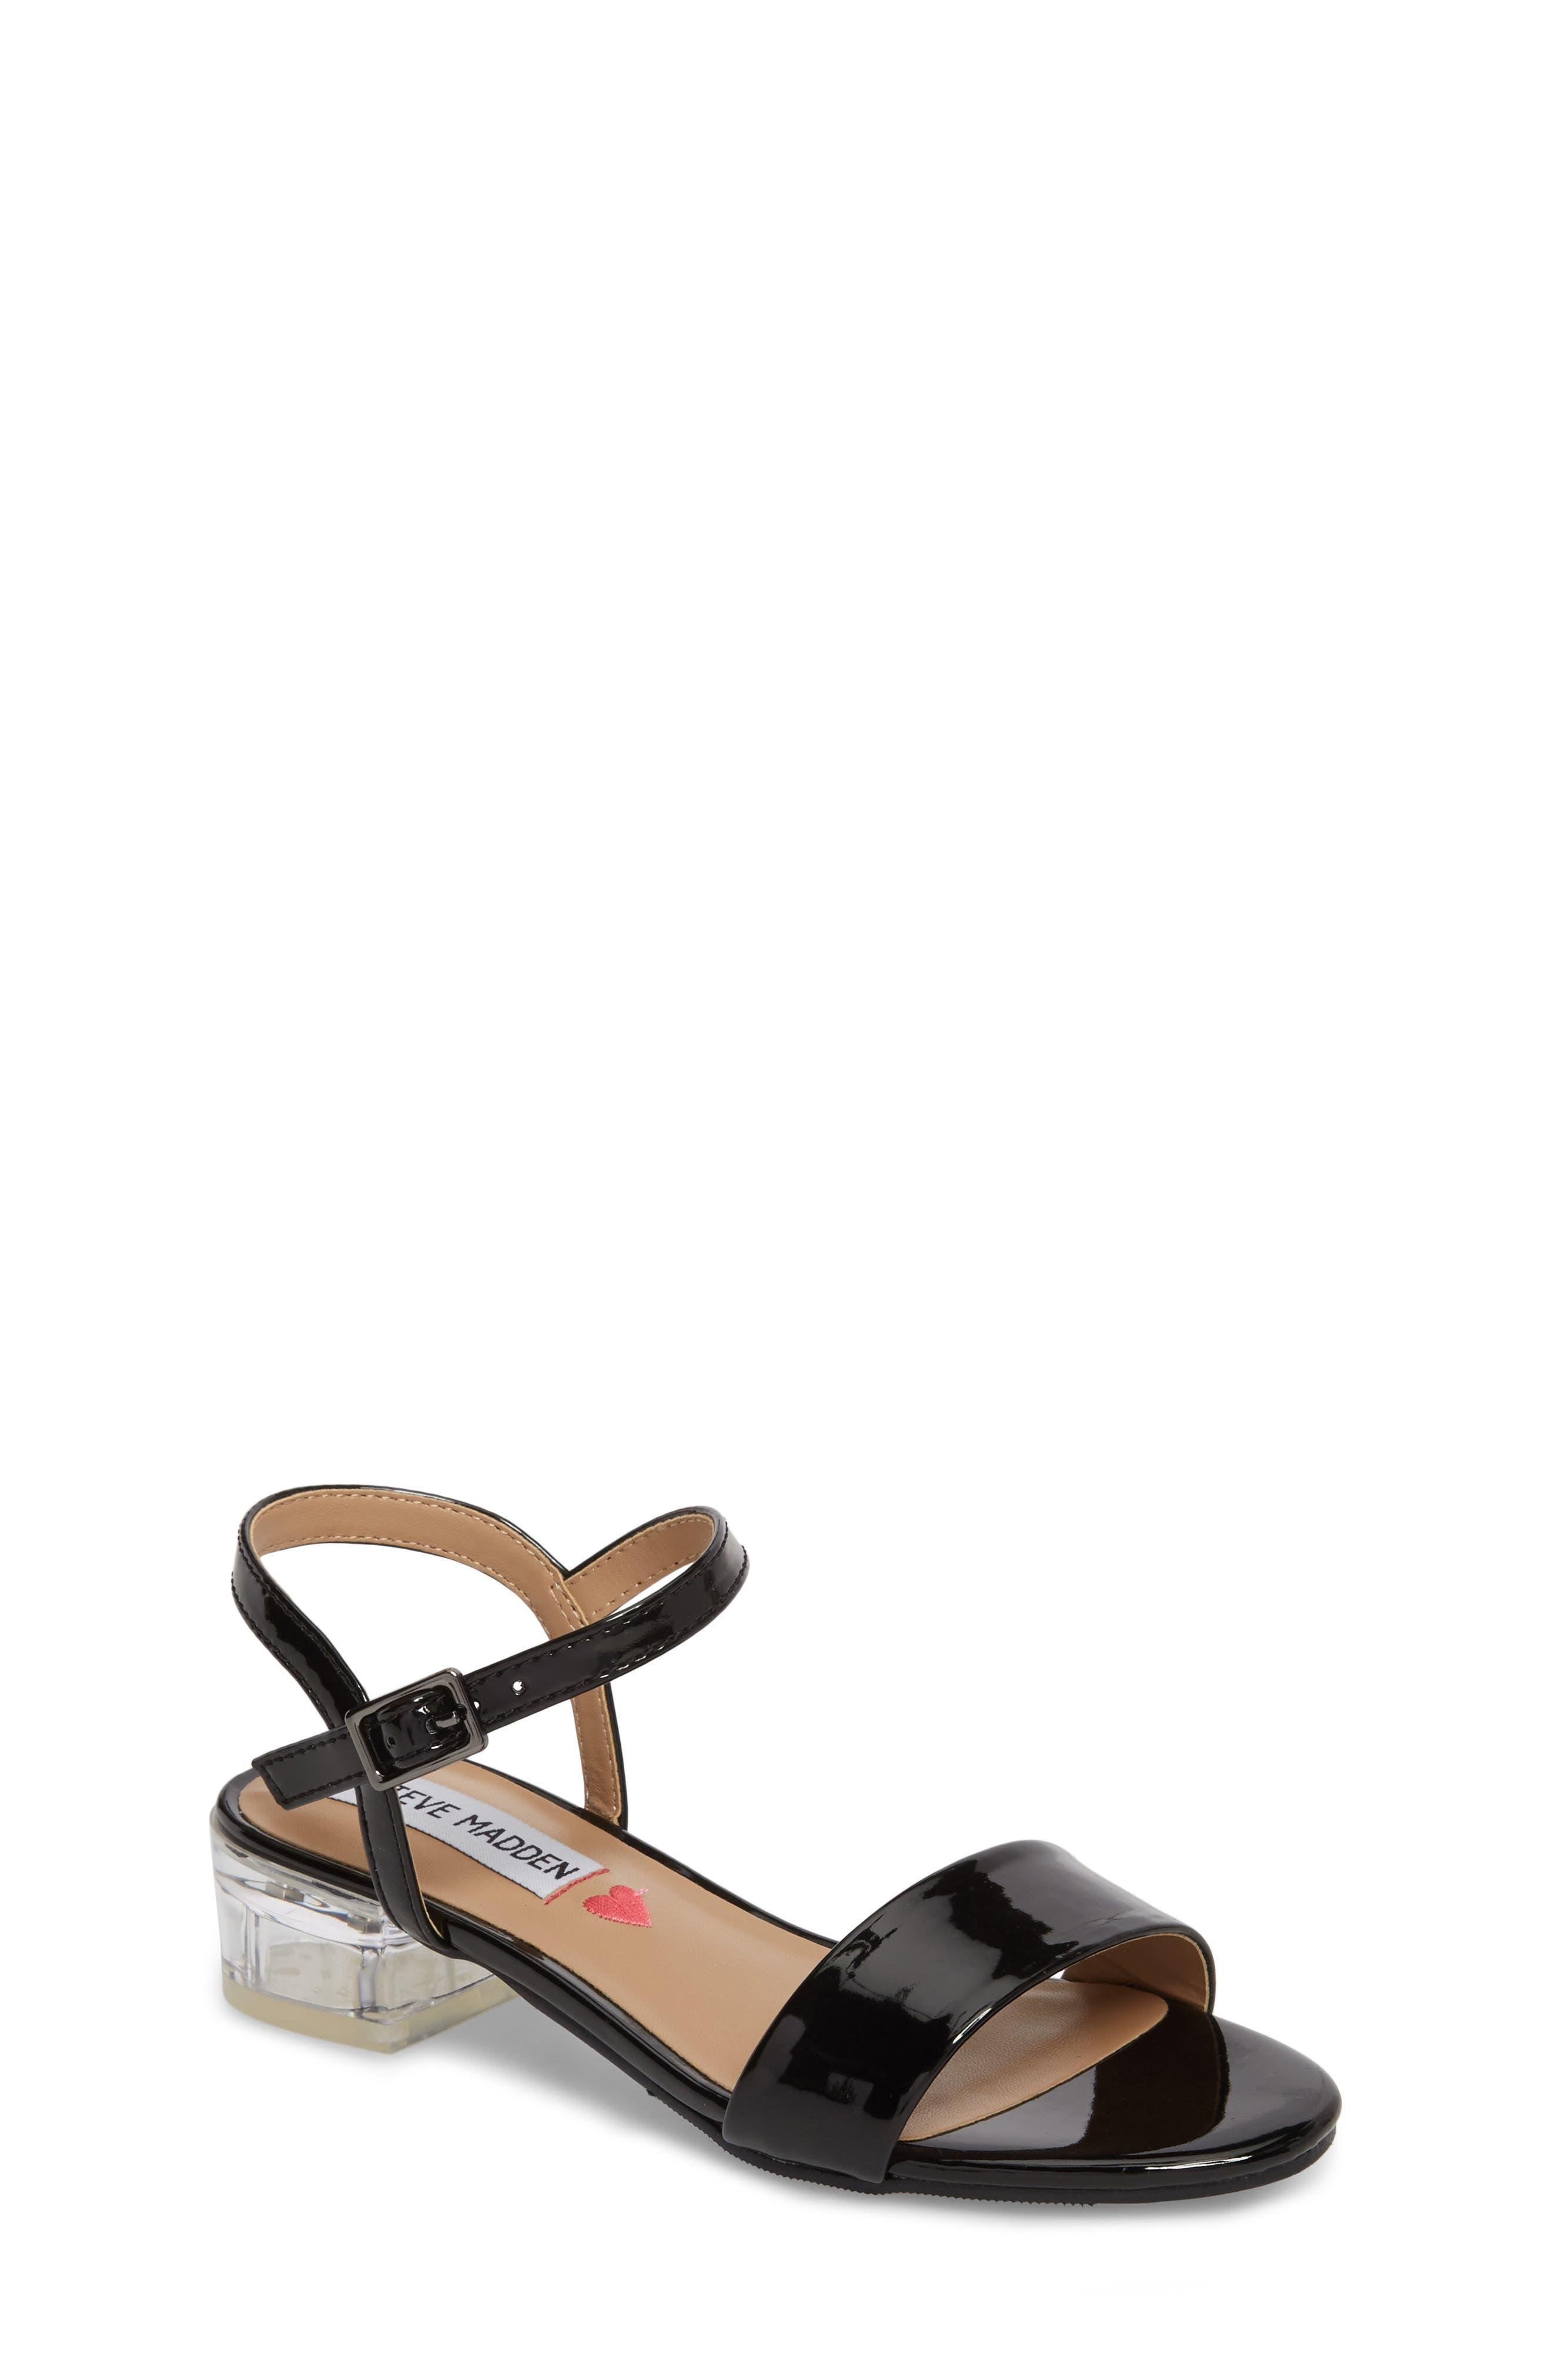 Jvallery Metallic Sandal,                         Main,                         color, 015